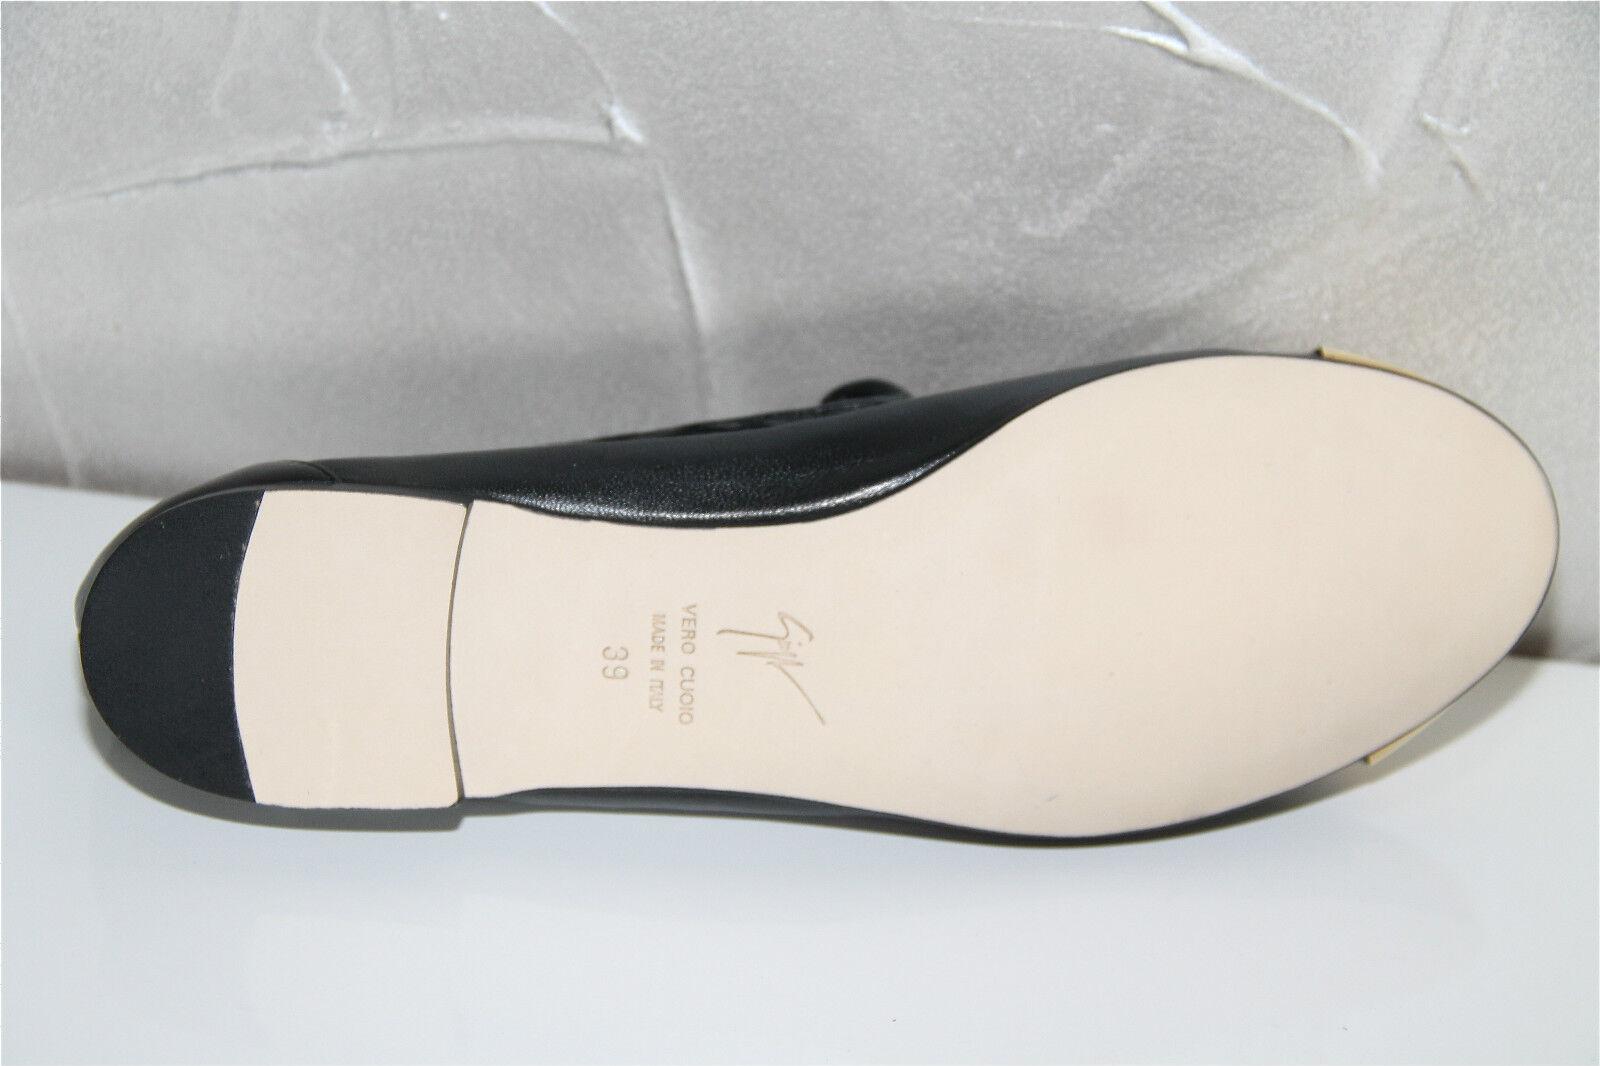 GIUSEPPE ZANOTTI DESIGN value black moccasins leather woman E46059 NEW value DESIGN 595 228d33